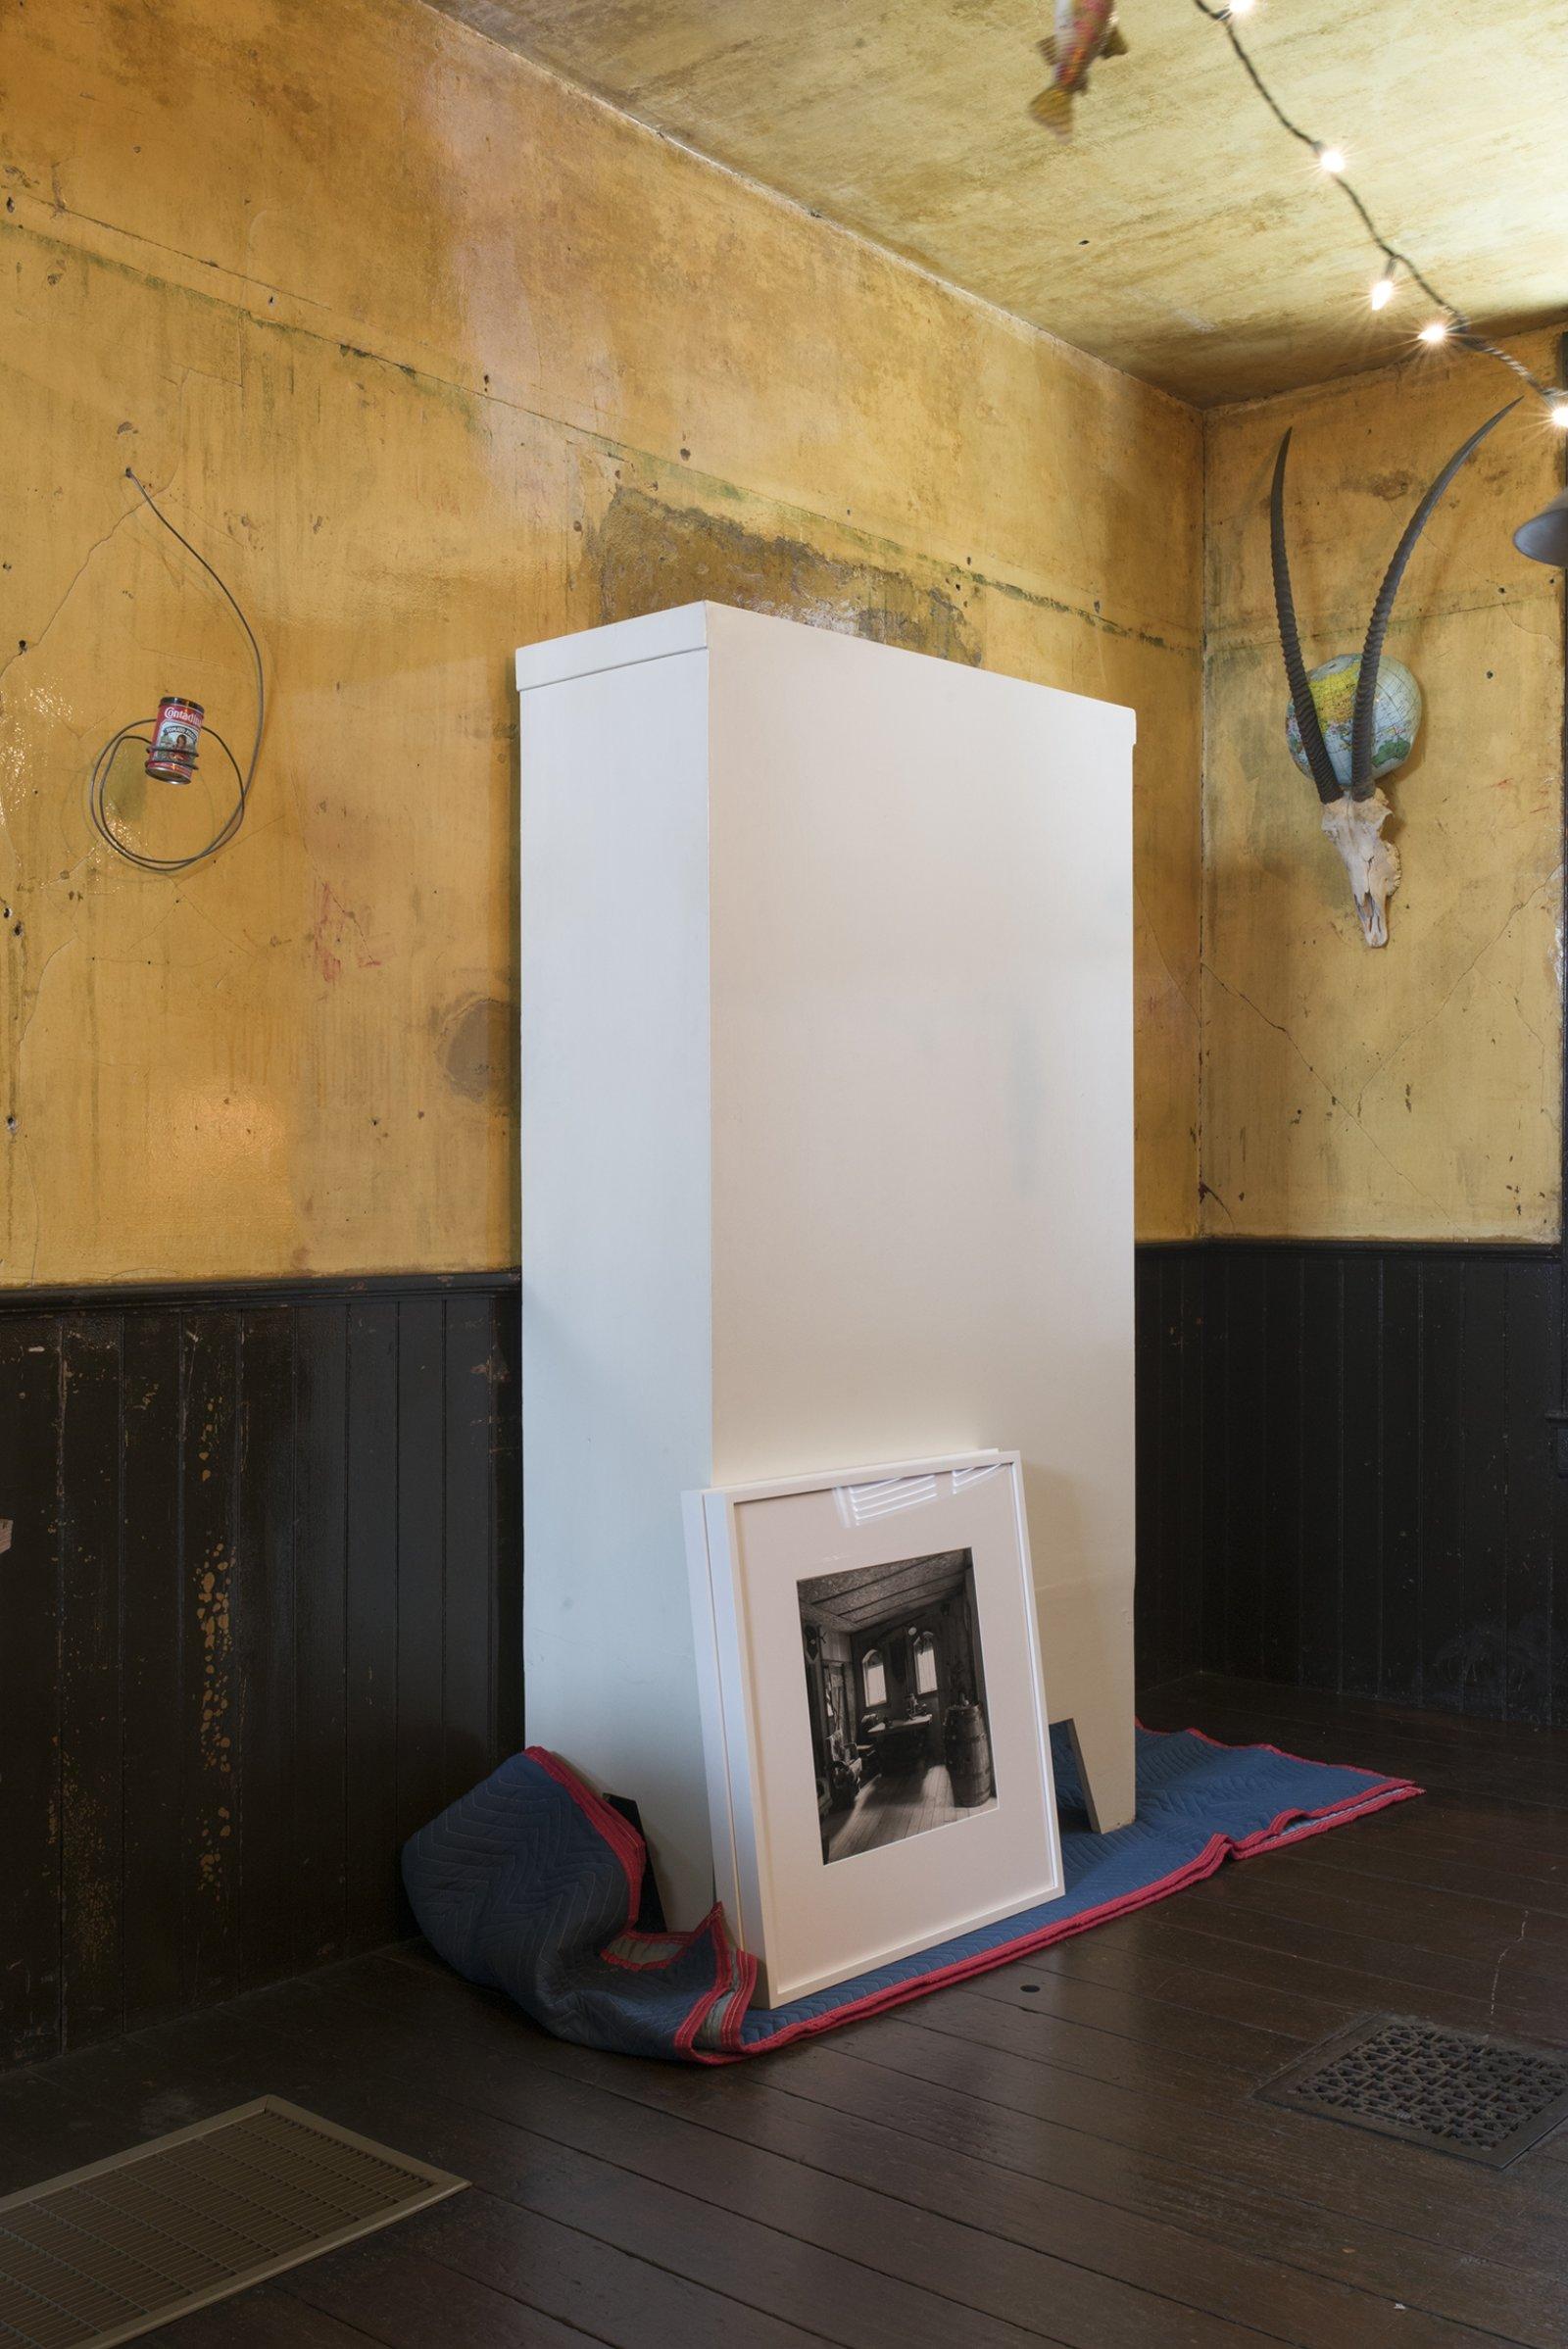 Liz Magor, Karl's Castle, 2003, 2 silver gelatin prints, each 16 x 20 in. (41 x 51 cm). Installation view, TIMESHARE, The David Ireland House, 500 Capp Street Foundation, San Francisco, USA, 2019 by Liz Magor